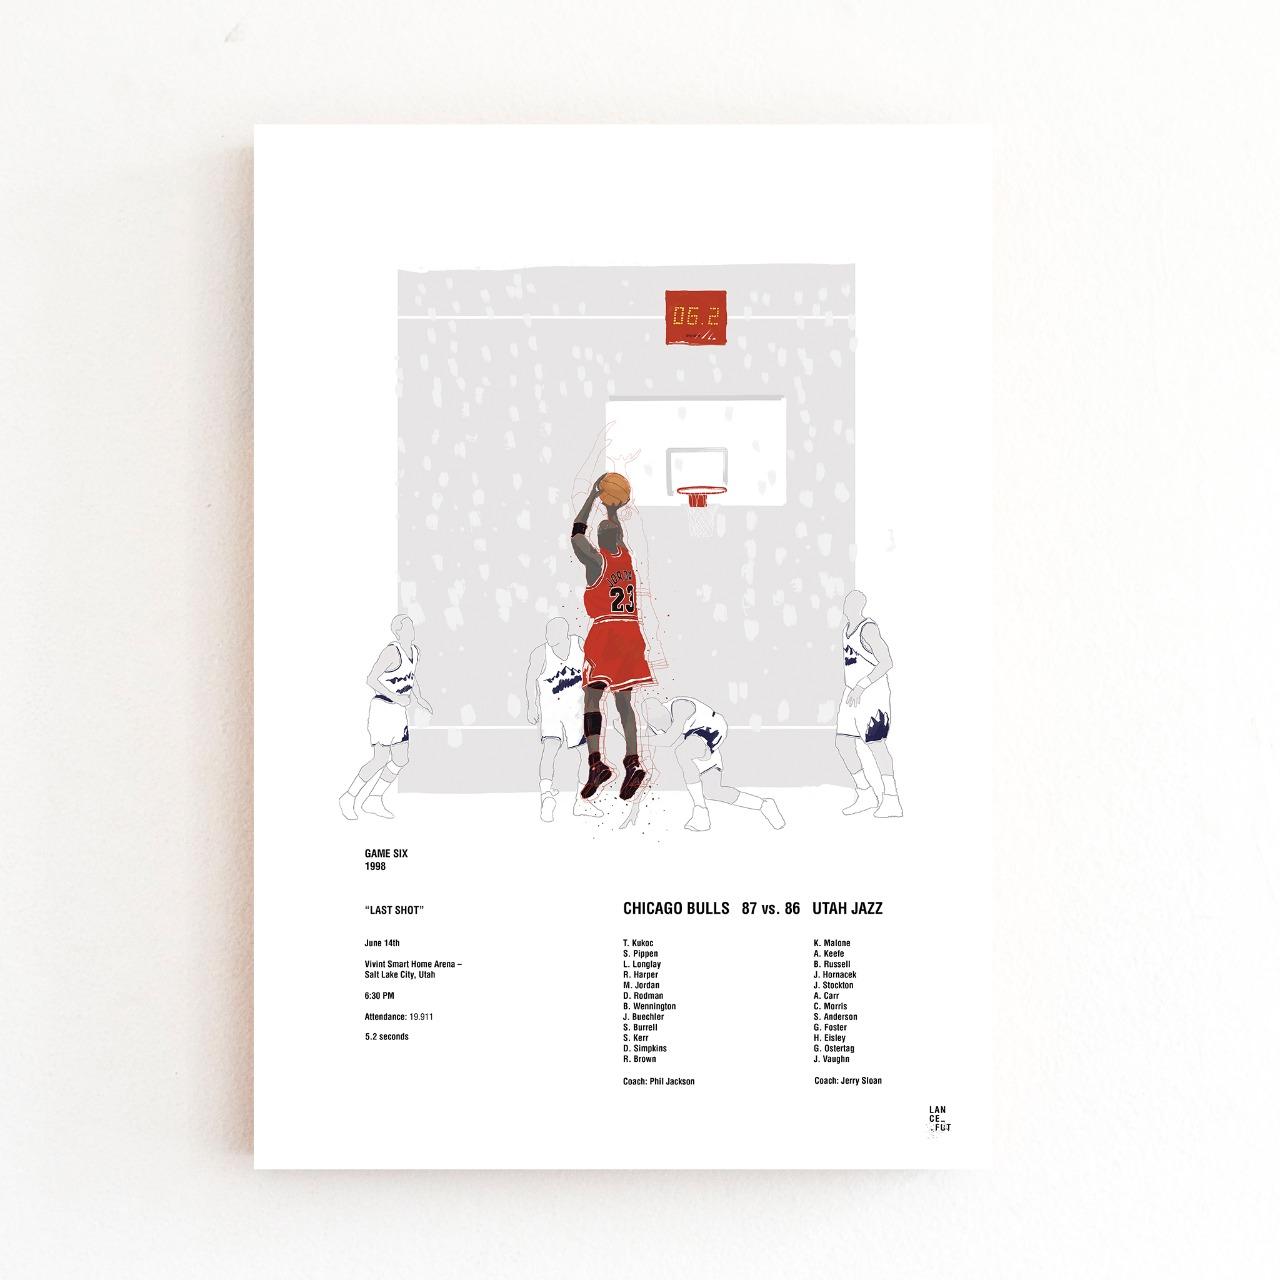 Michael Jordan - Arremesso Final